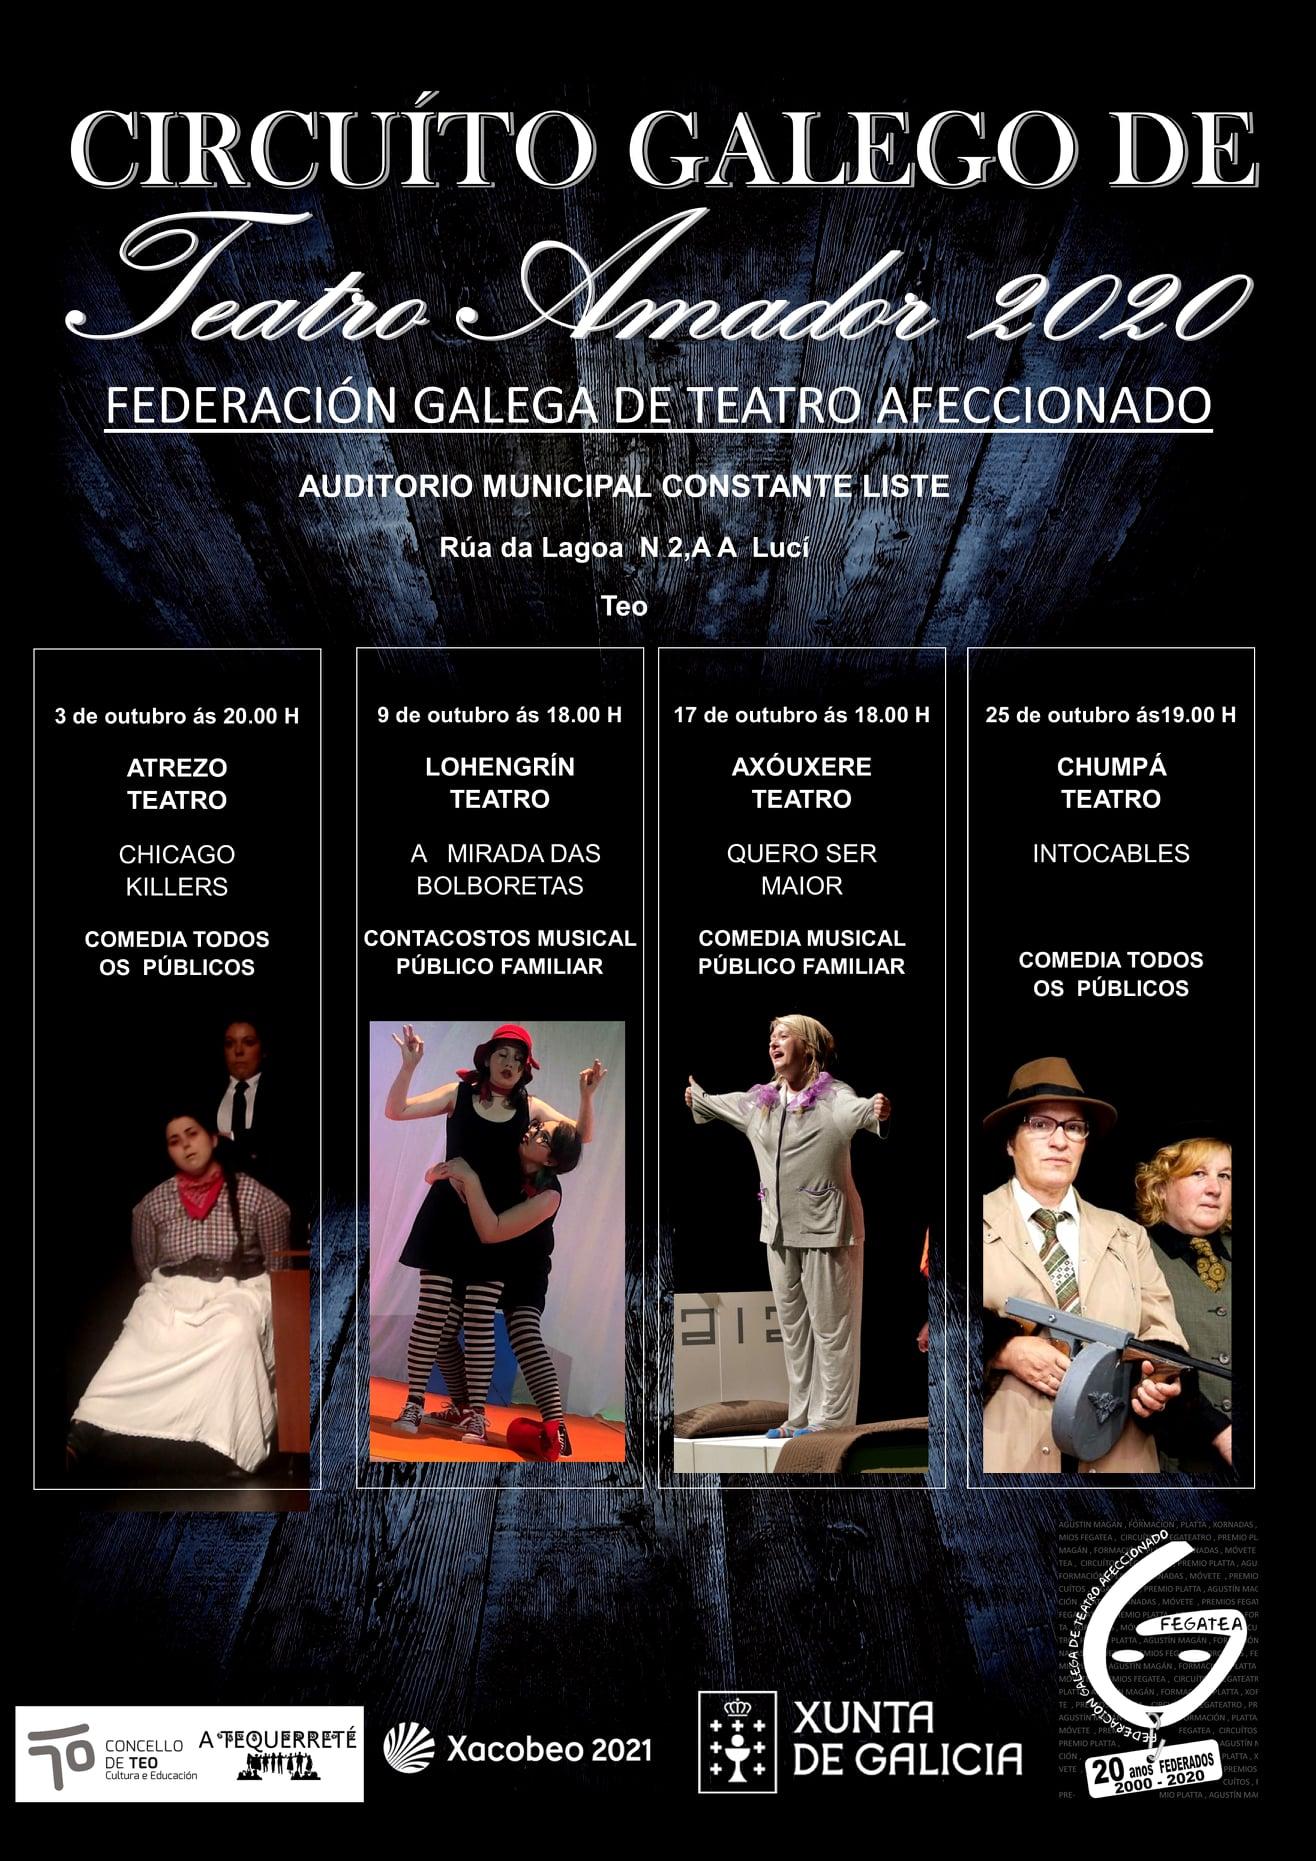 Cartel do circuito galego de teatro amador 2020 - Teo